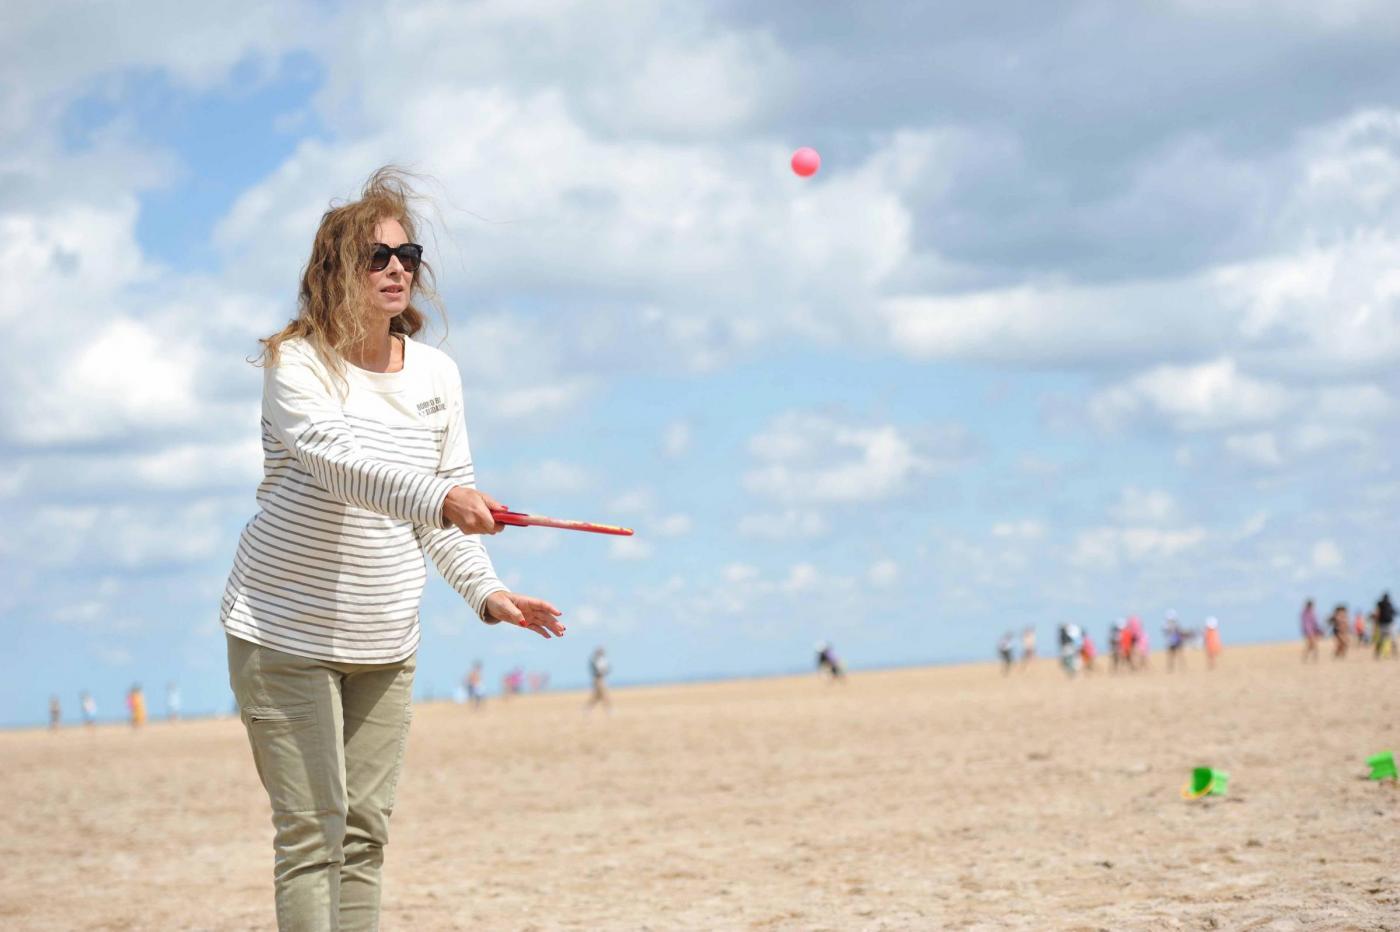 Valerie Trierweiler visita i bimbi disaggiati in Normandia06